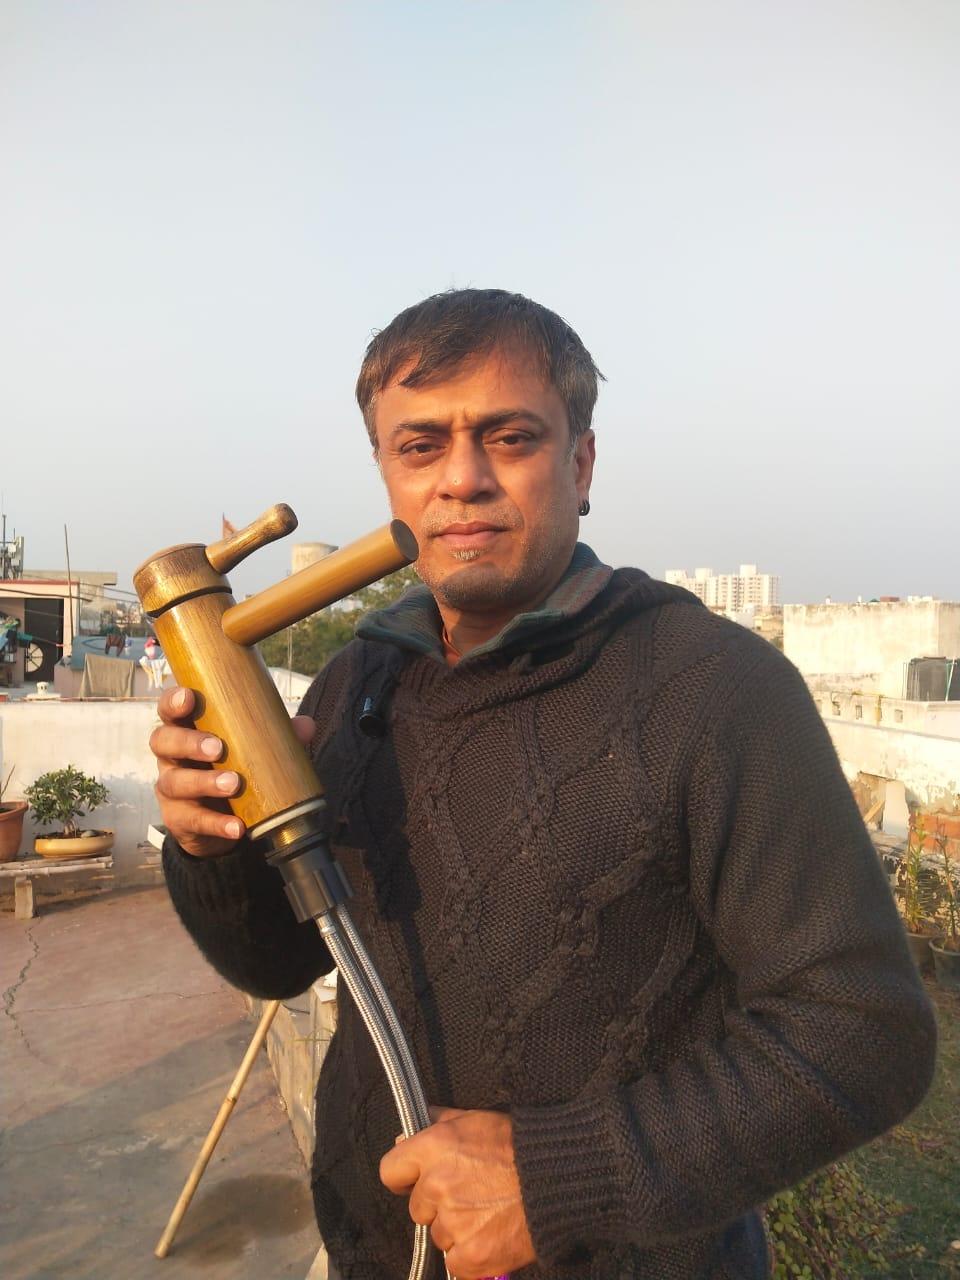 Kingshuk Sircar, SAN ECO Vision, Bamboo, Social Entrepreneurship, Faiz Askari